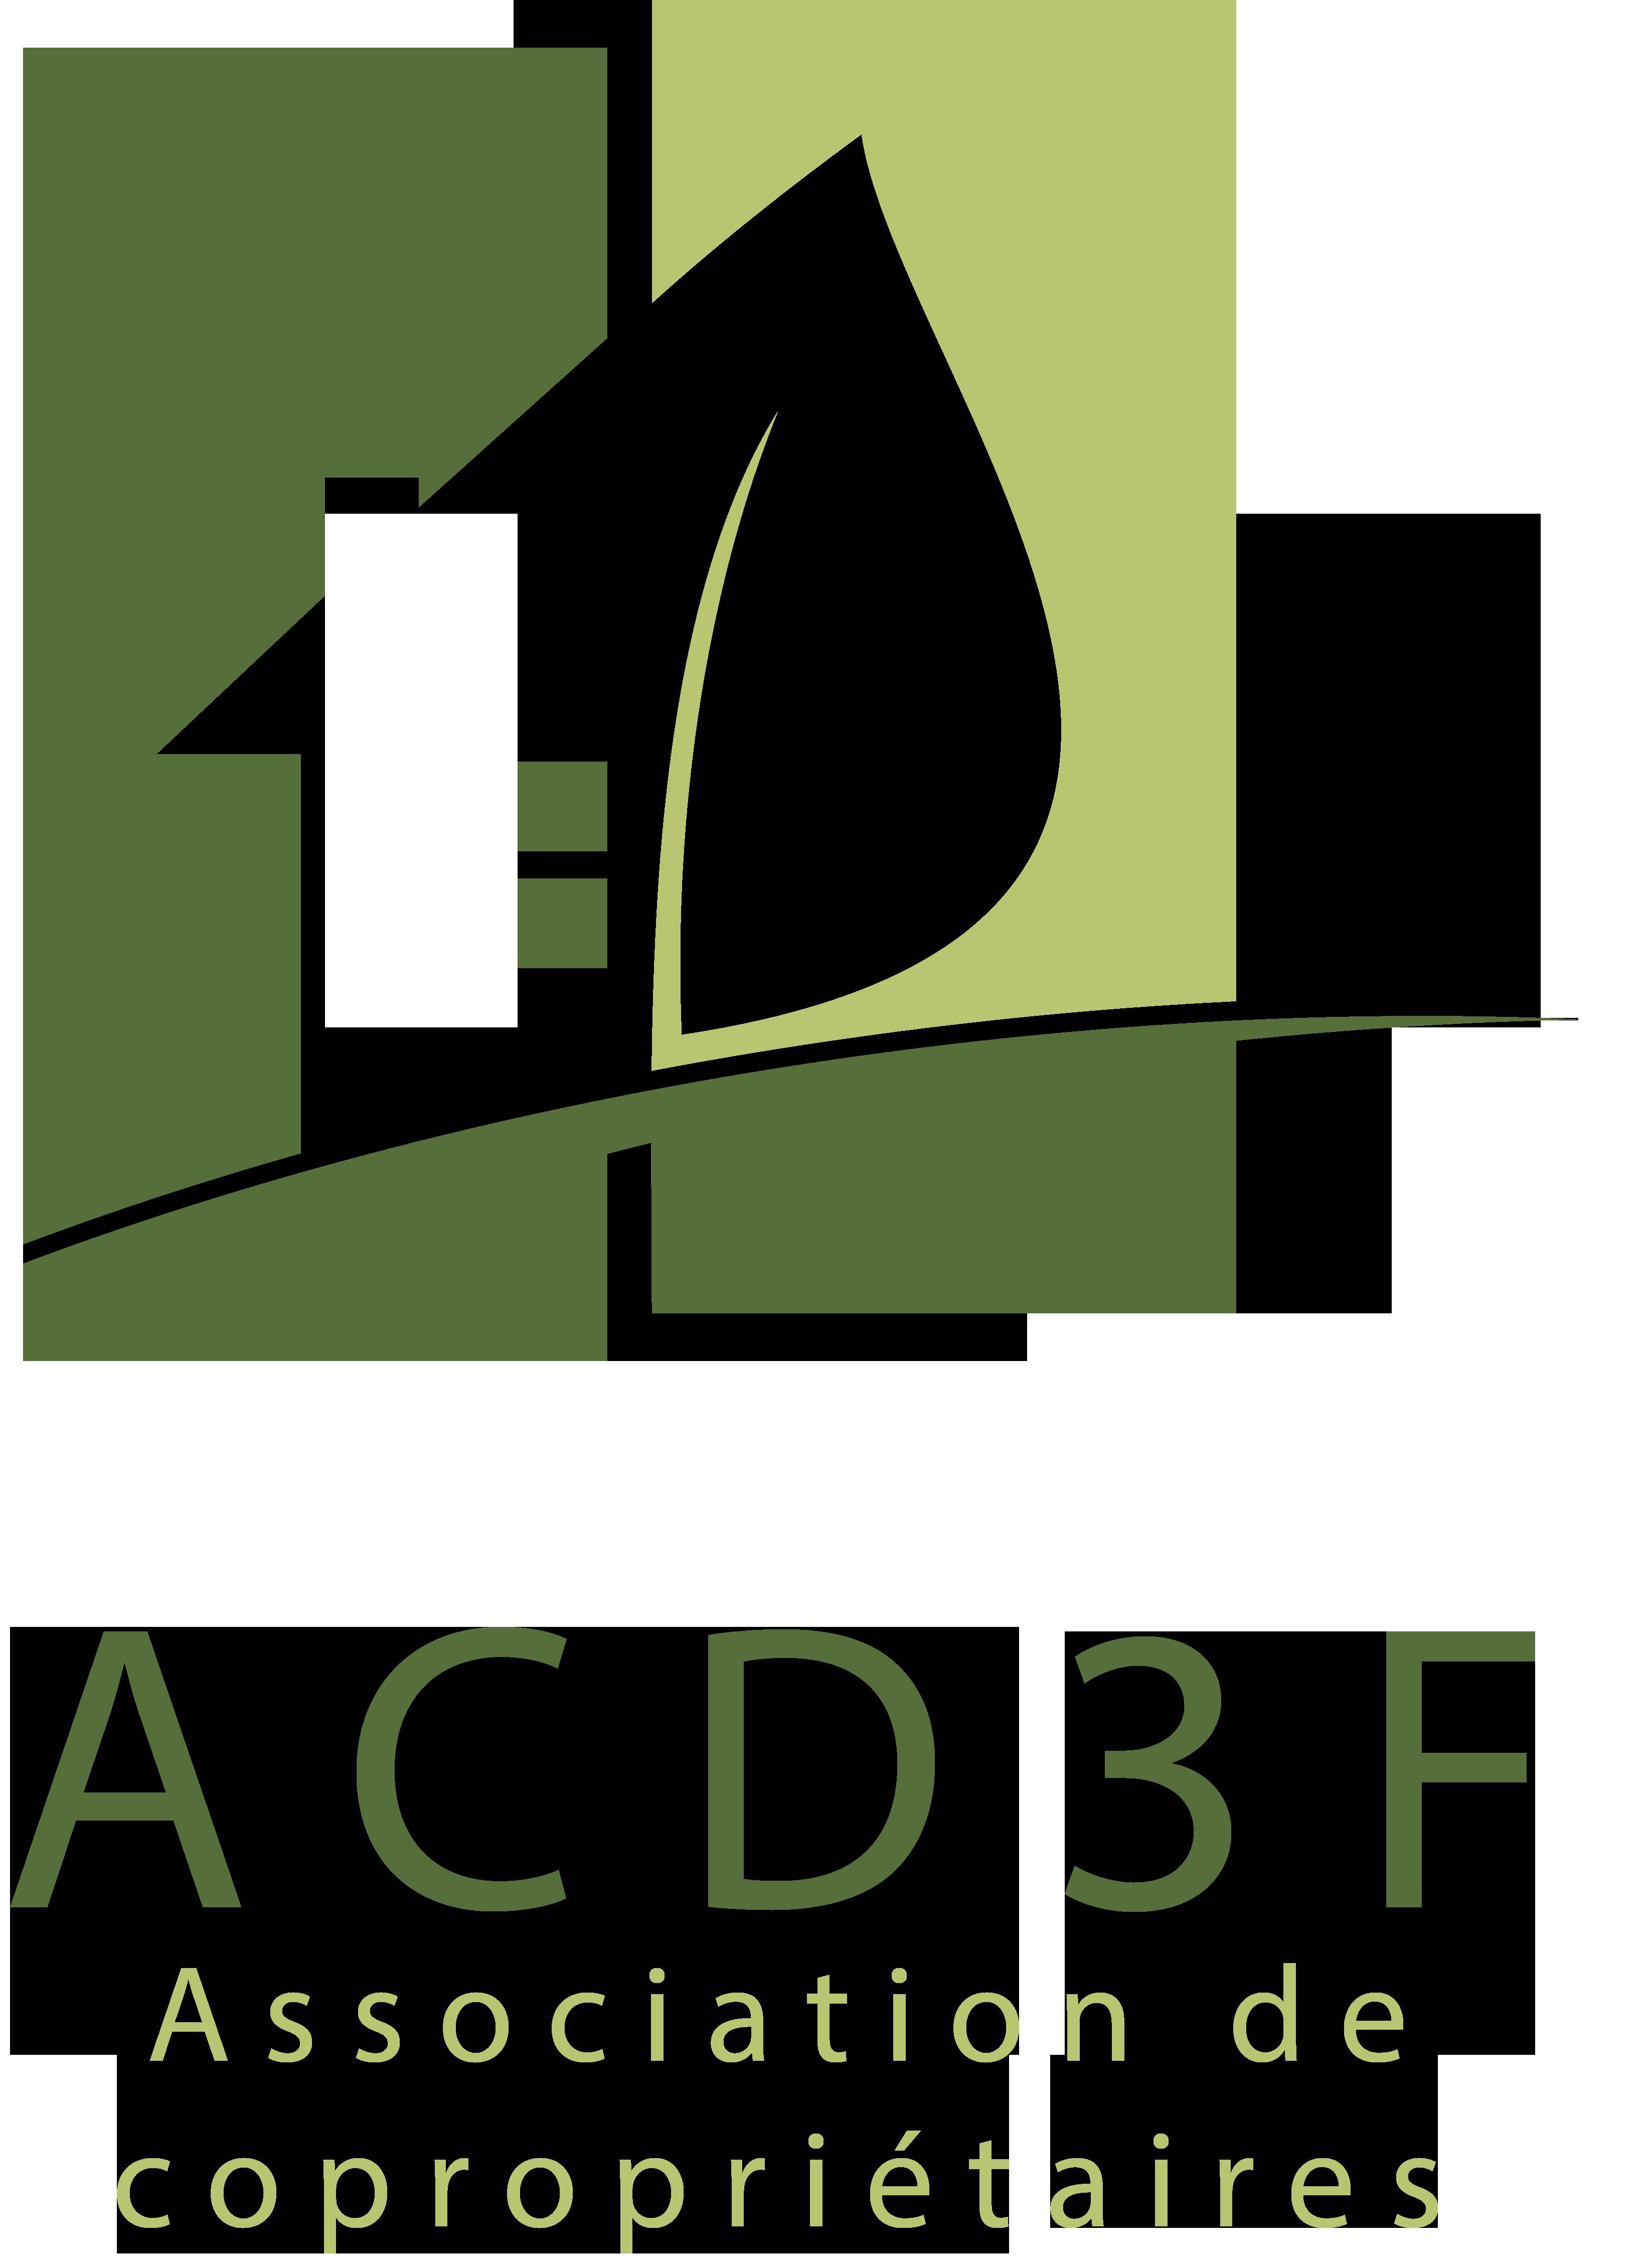 acd3f-logo